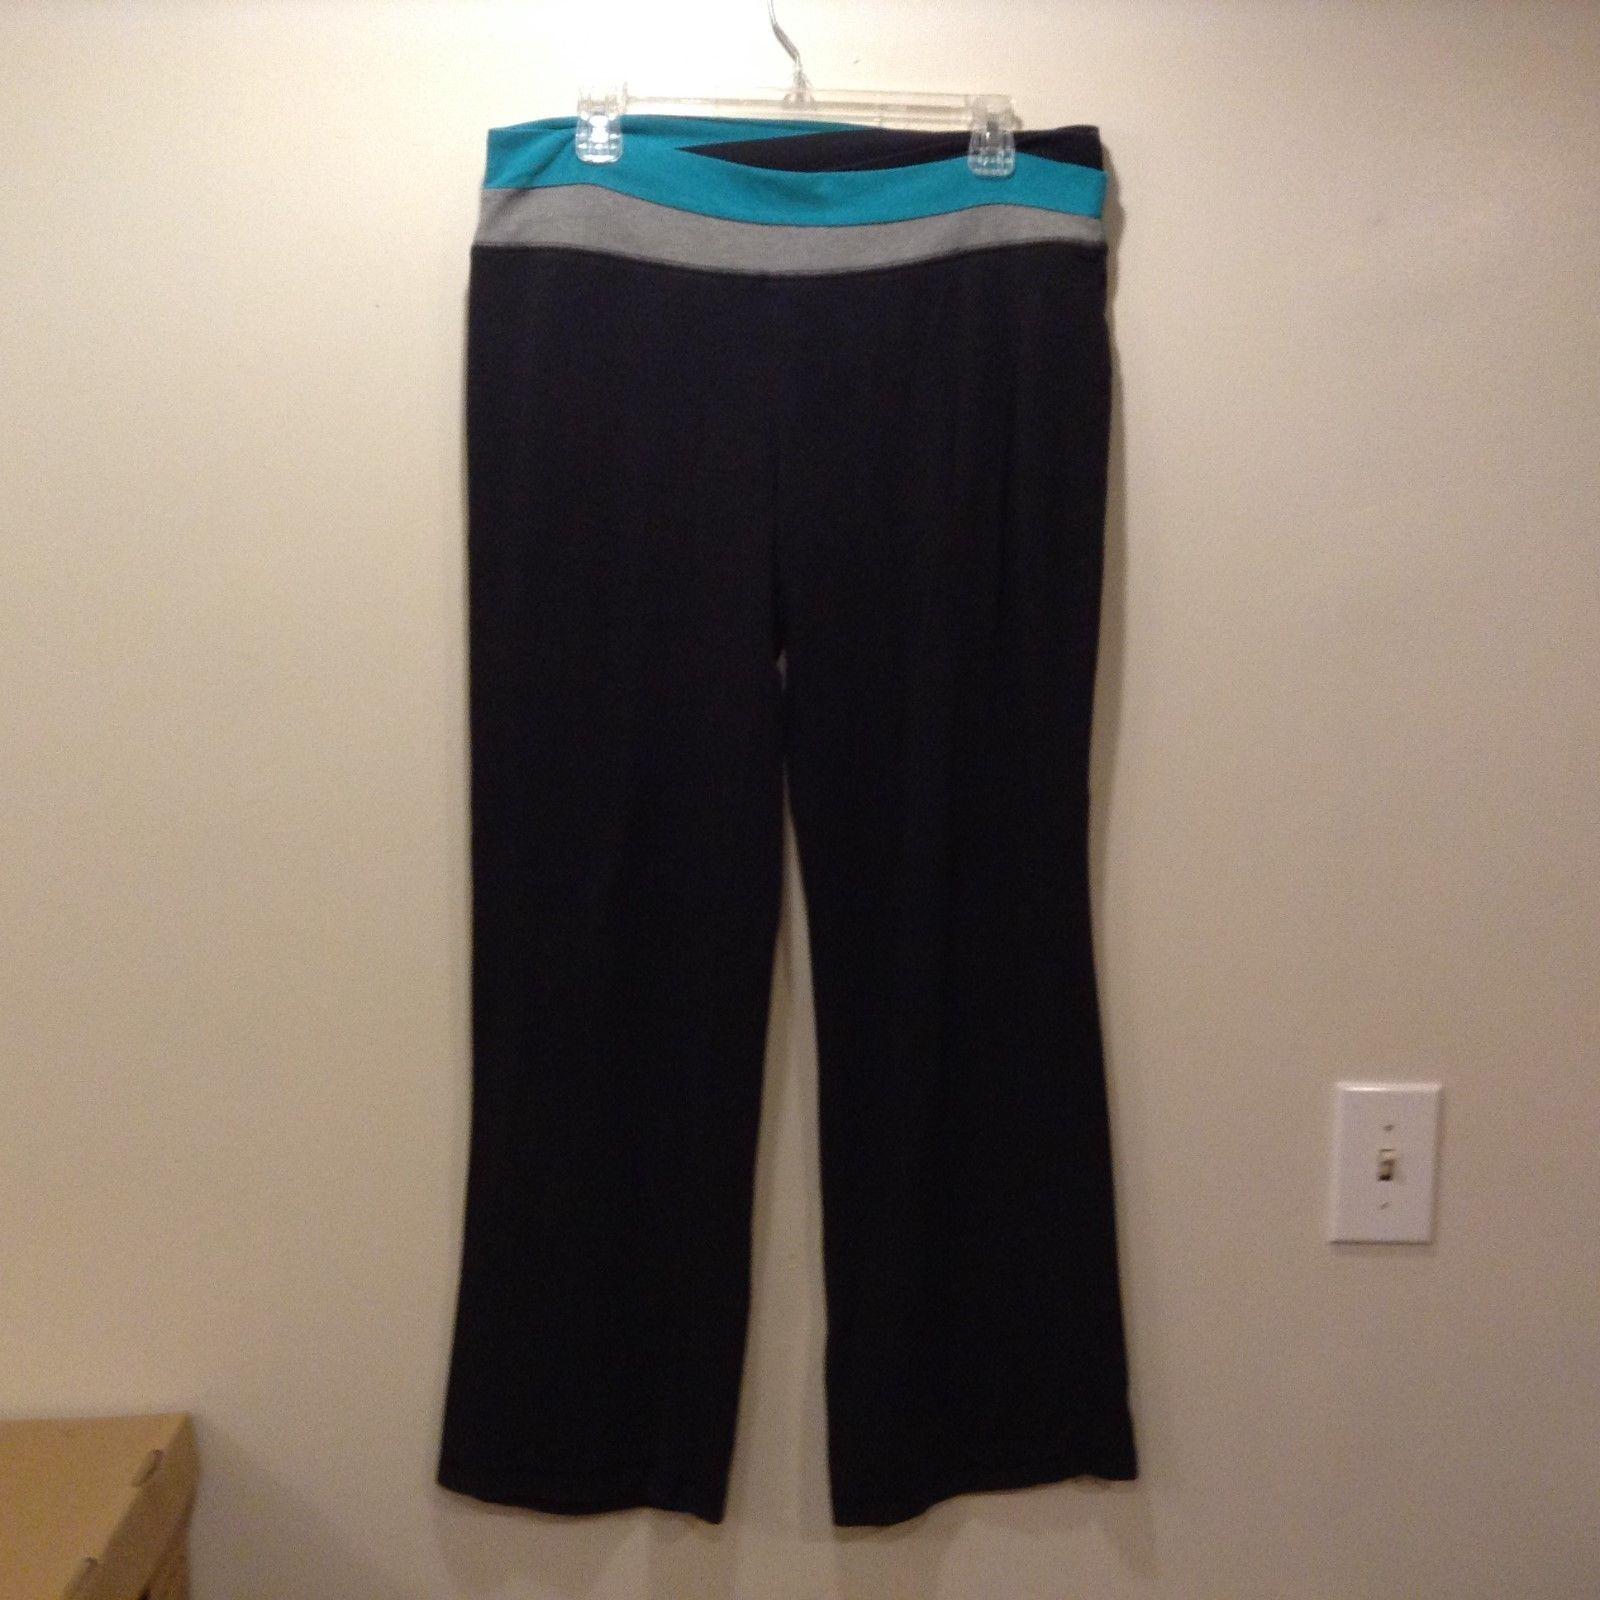 Just Be Ladies Black w Grey/Lt Blue Waistband Legging Pants Sz LG